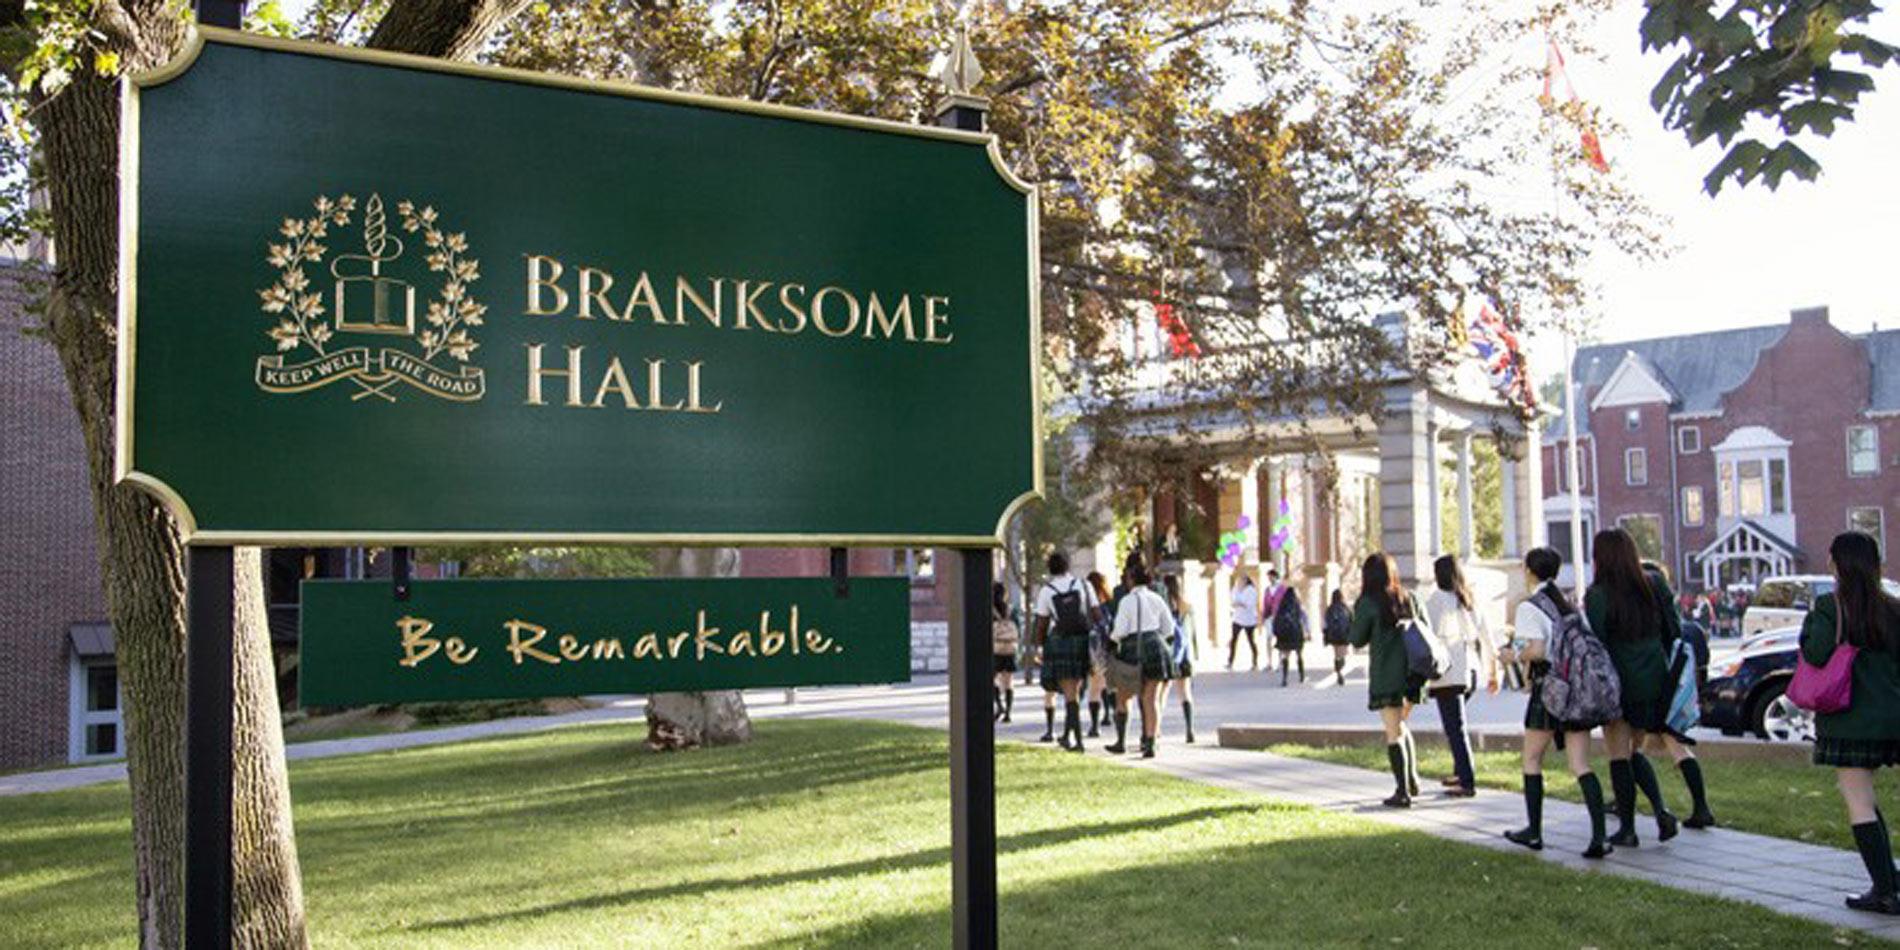 Branksome-Hall-School-001.jpg - 338.59 kb